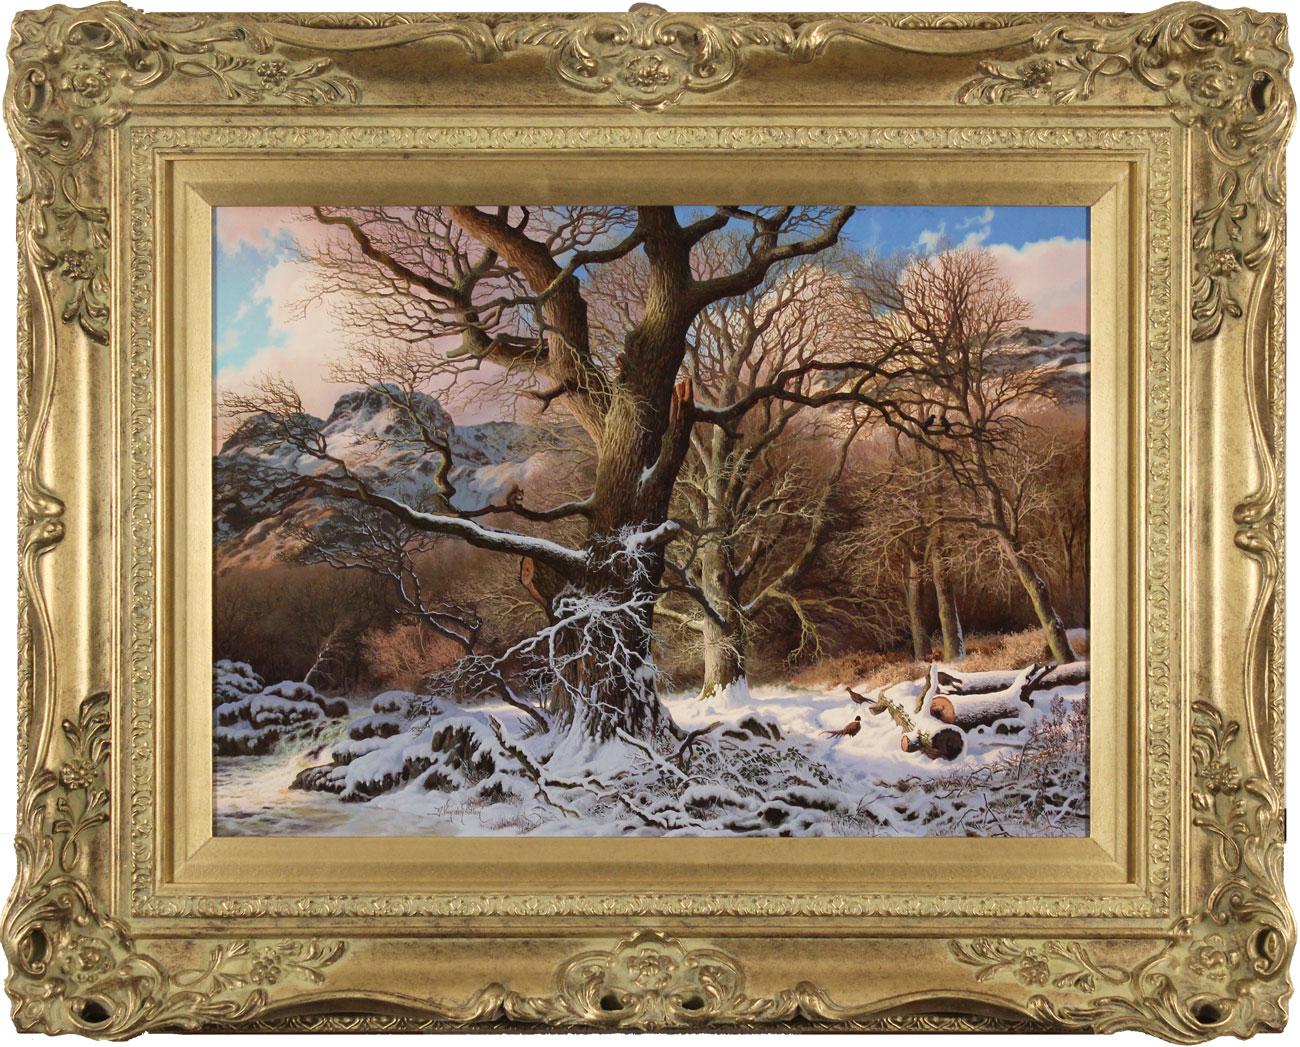 Daniel Van Der Putten, Original oil painting on panel, Winter at Great Langdale. Click to enlarge